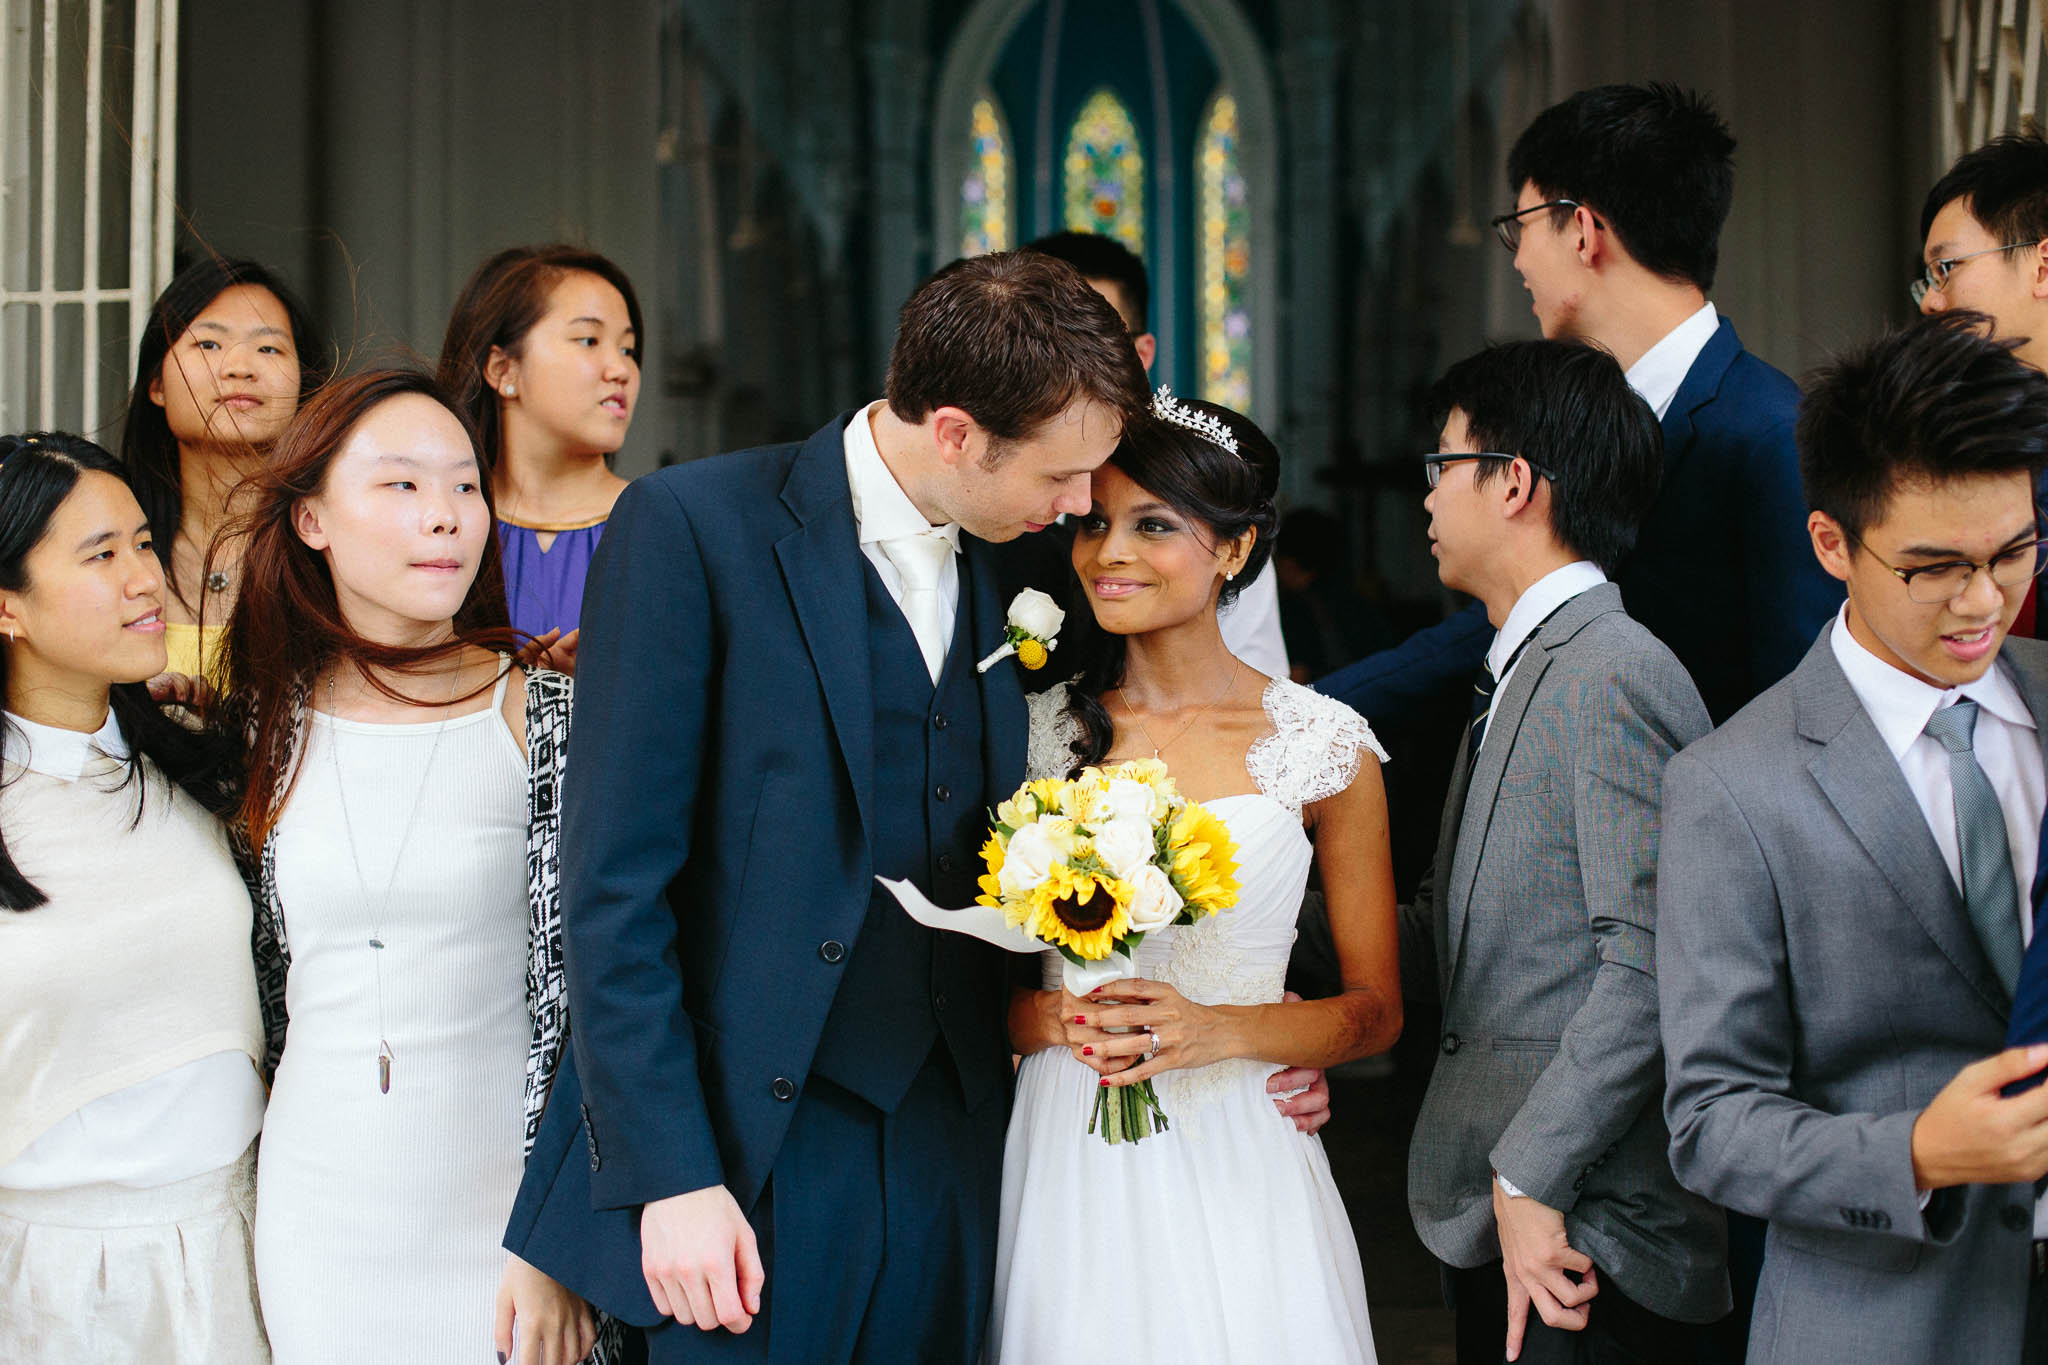 singapore-wedding-photographer-st-andrews-cathedral-renita-david-36.jpg